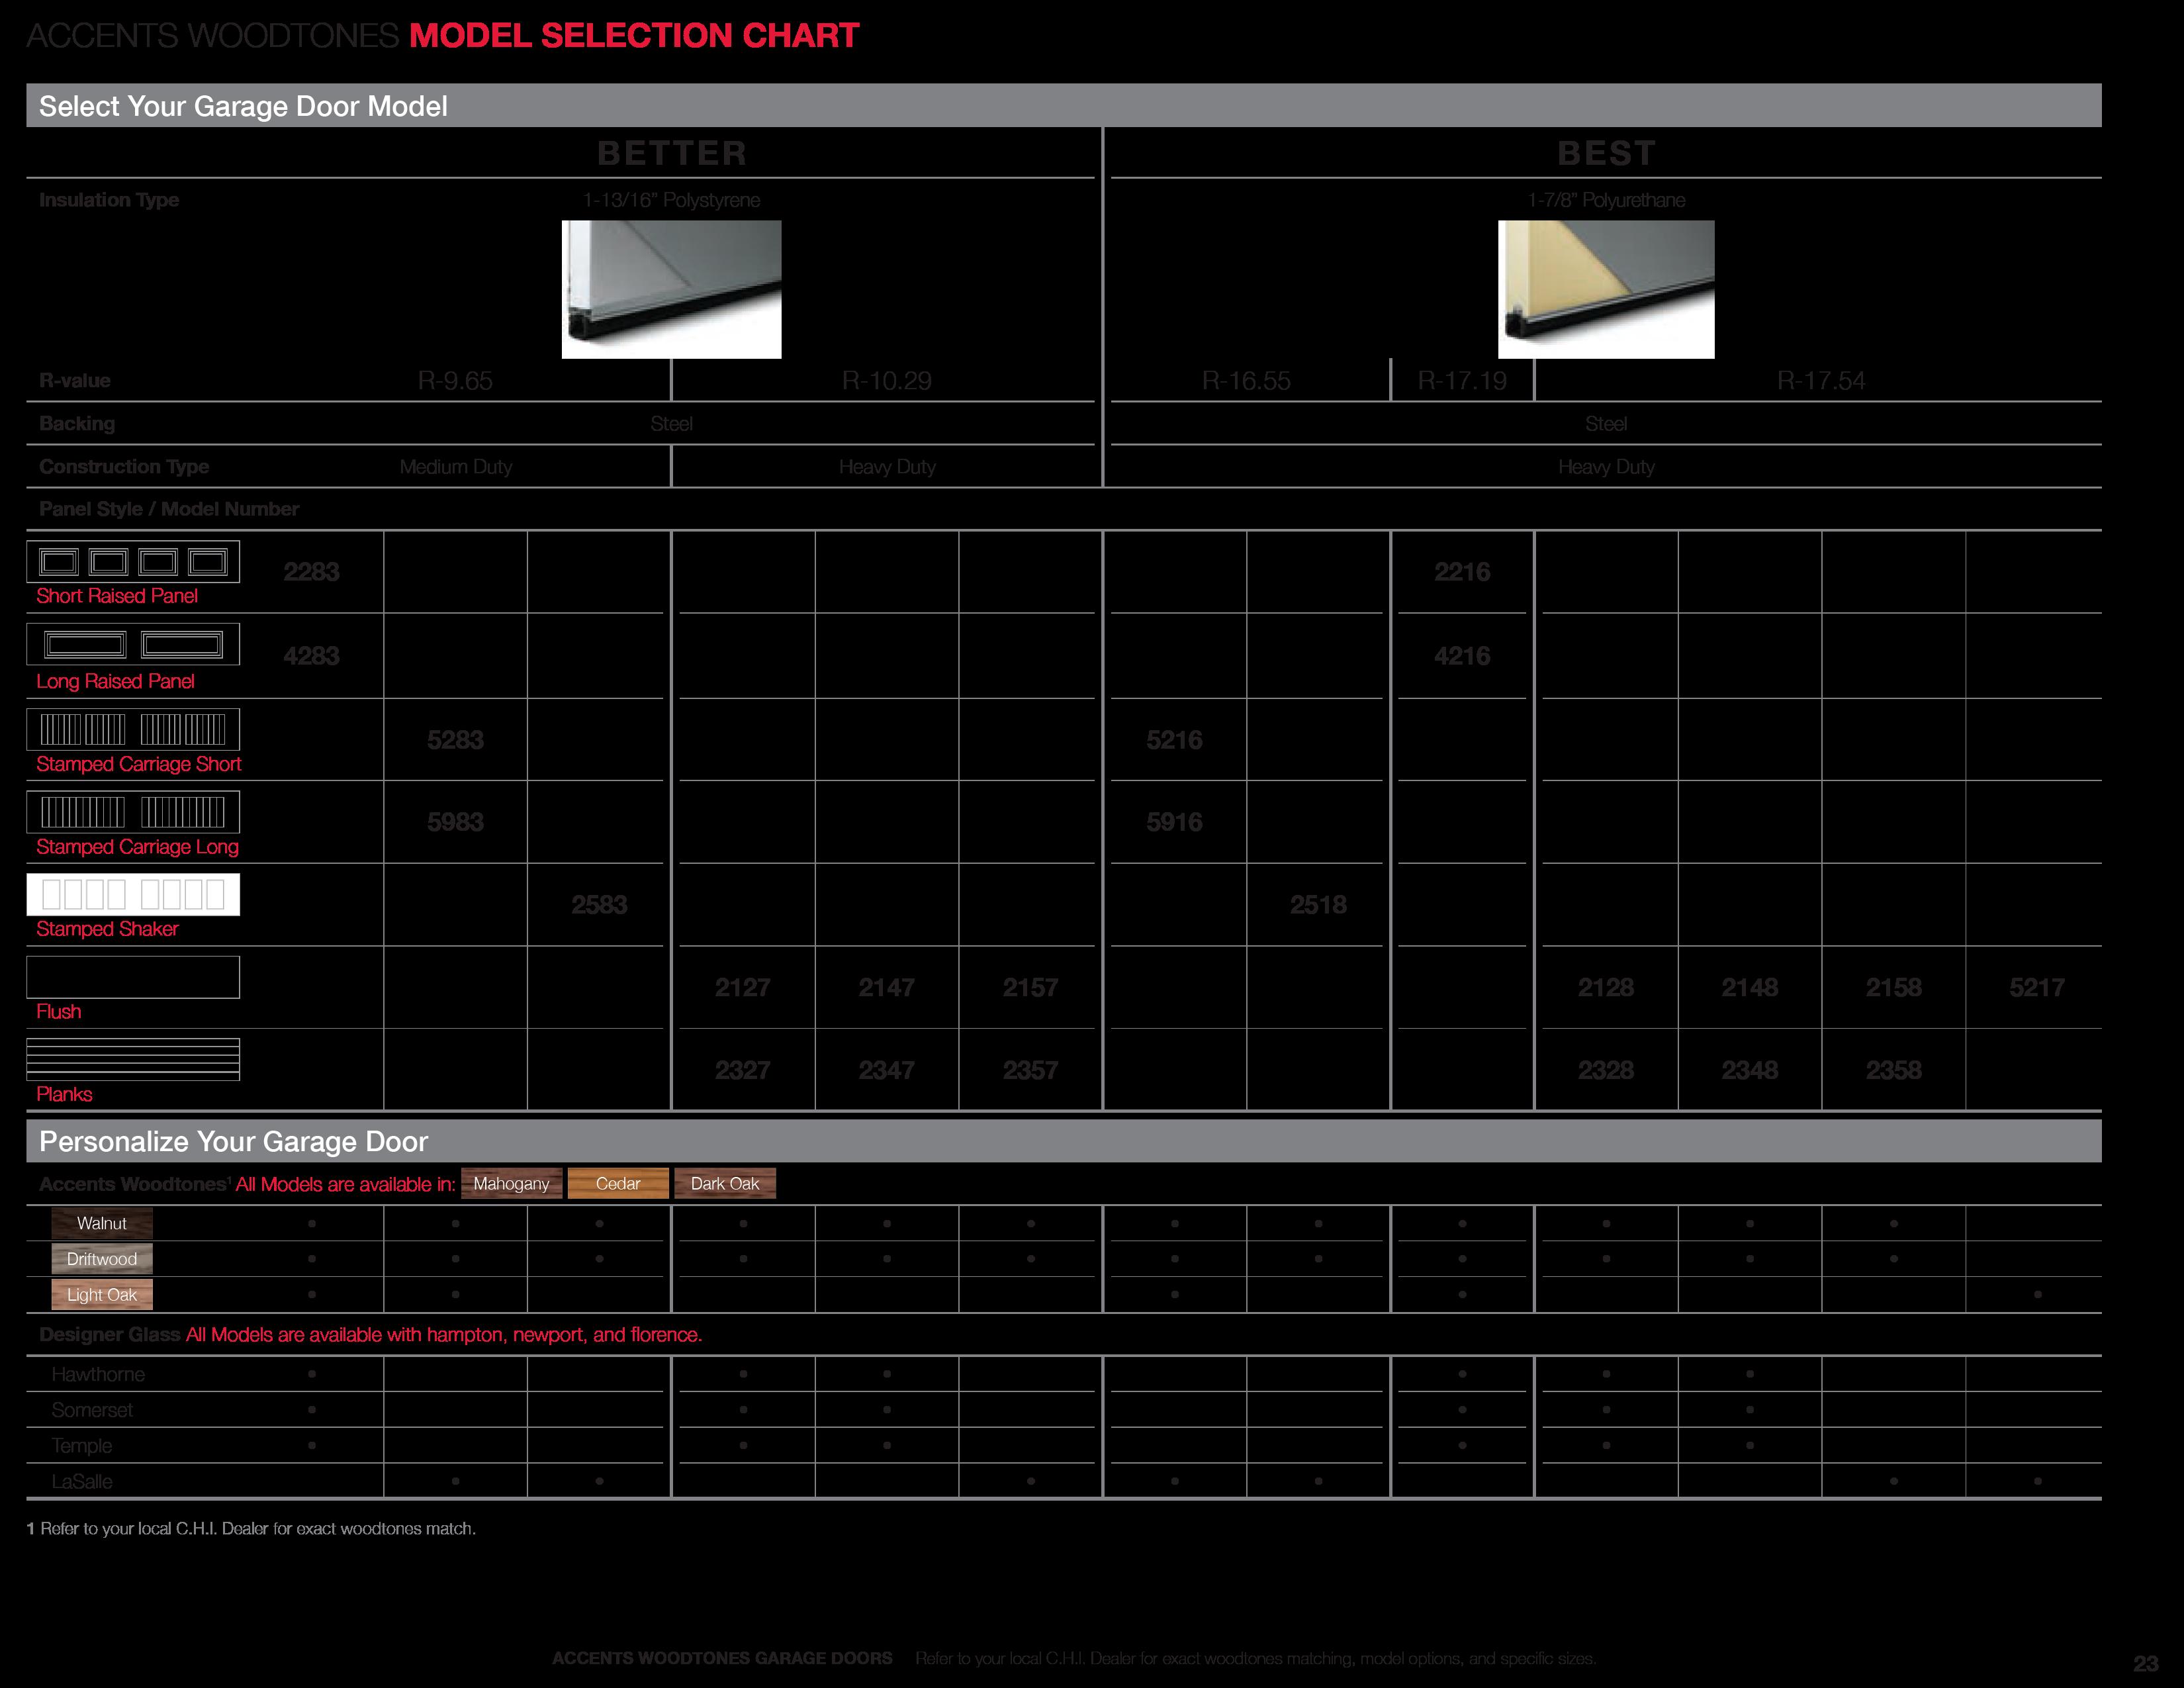 model selection chart